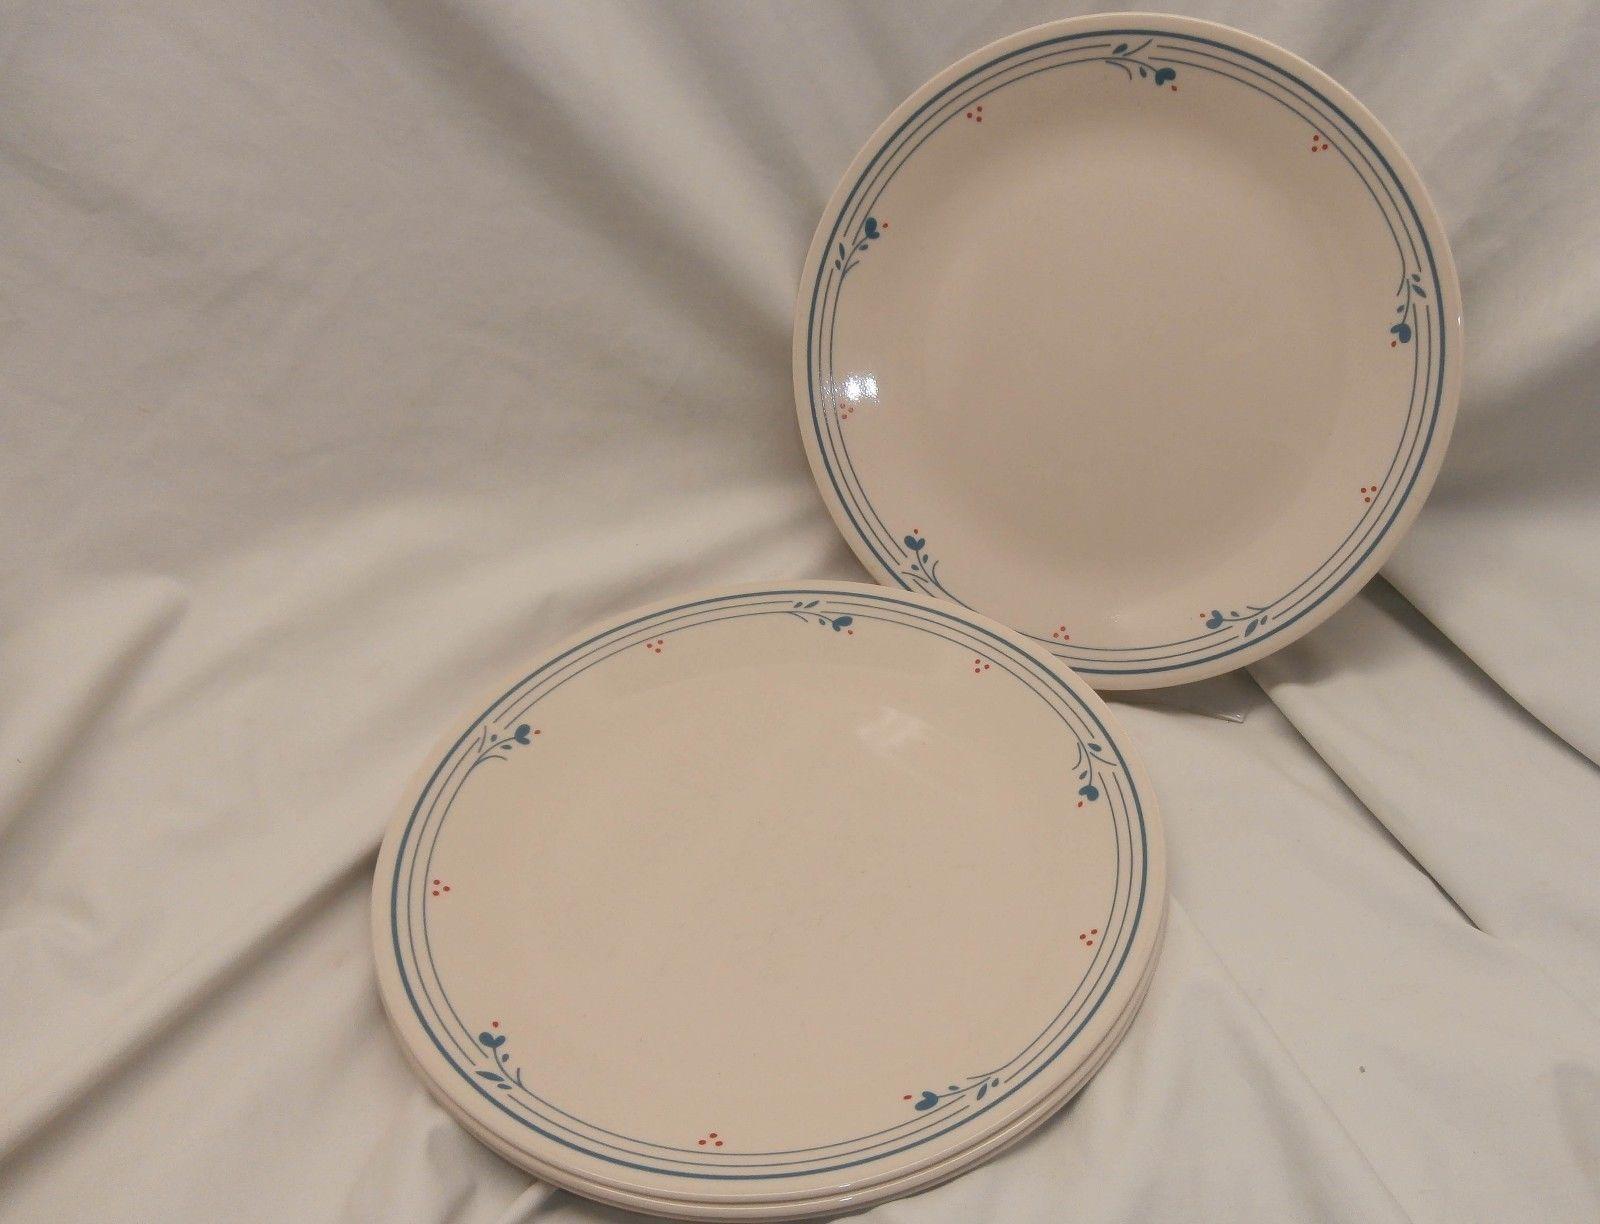 Set of 4 Corning Corelle Country Violets 10.25  Dinner Plates Retired USA - $30.72 & Corelle Glasses: 12 listings